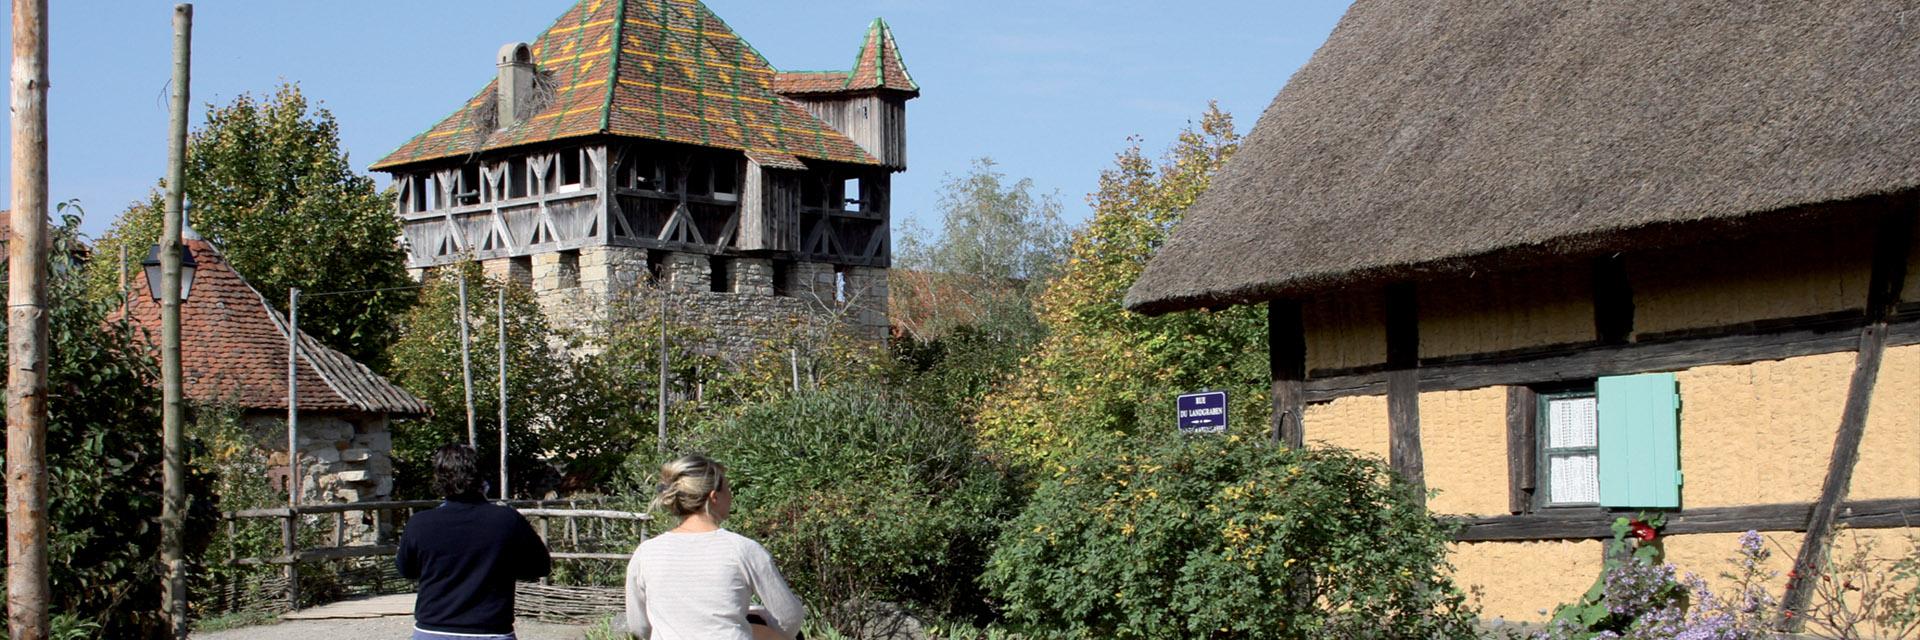 Village_club_vacances_alsace-relais-saint-bernard-ecomuse